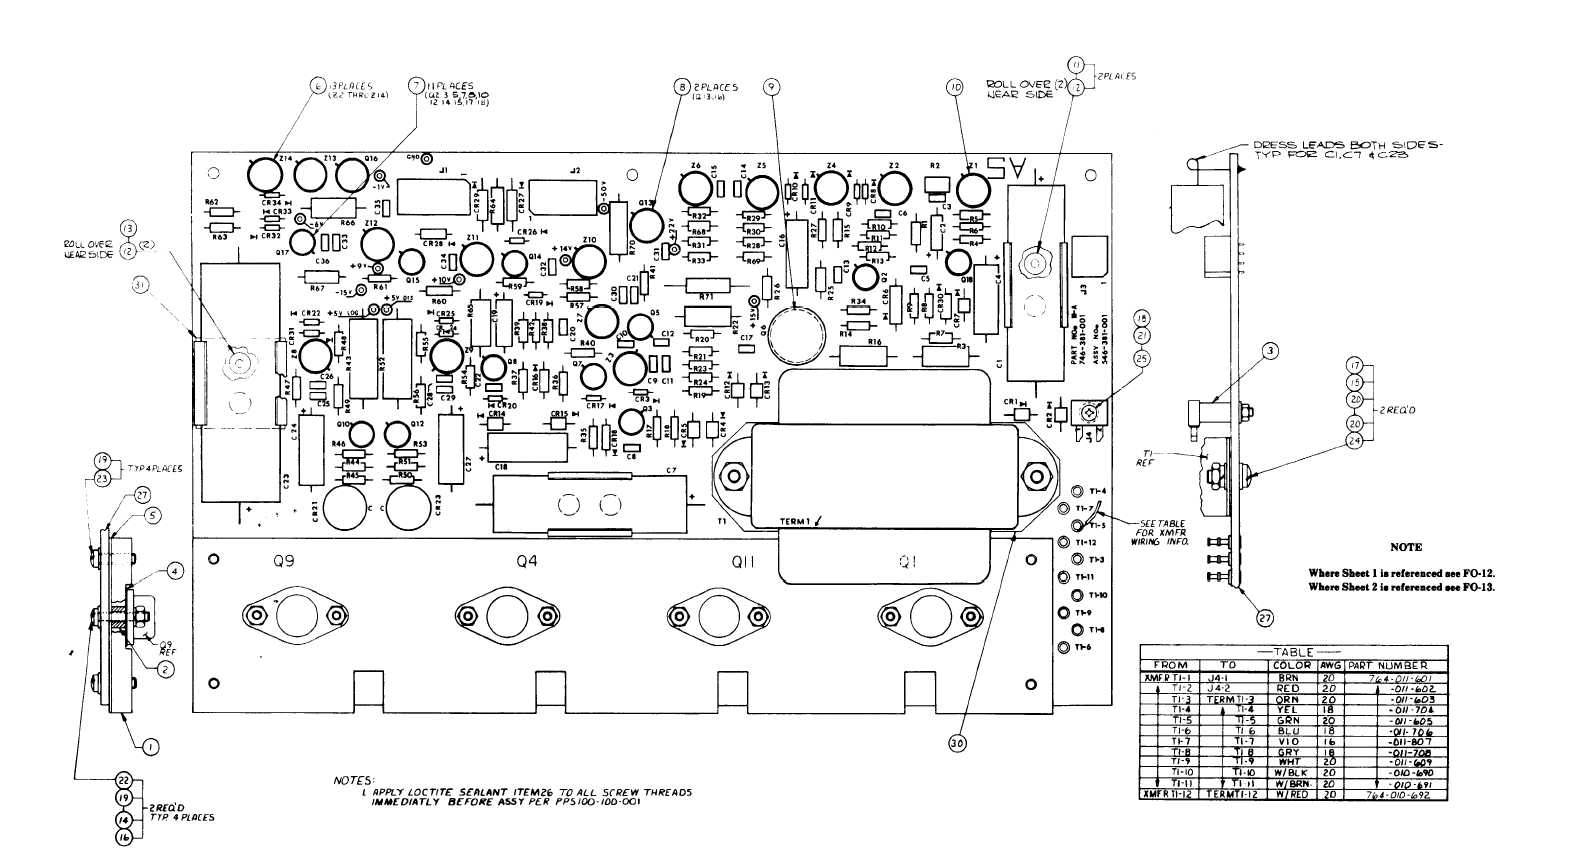 Fo 12 Circuit Board A 5 Component Location Diagram For